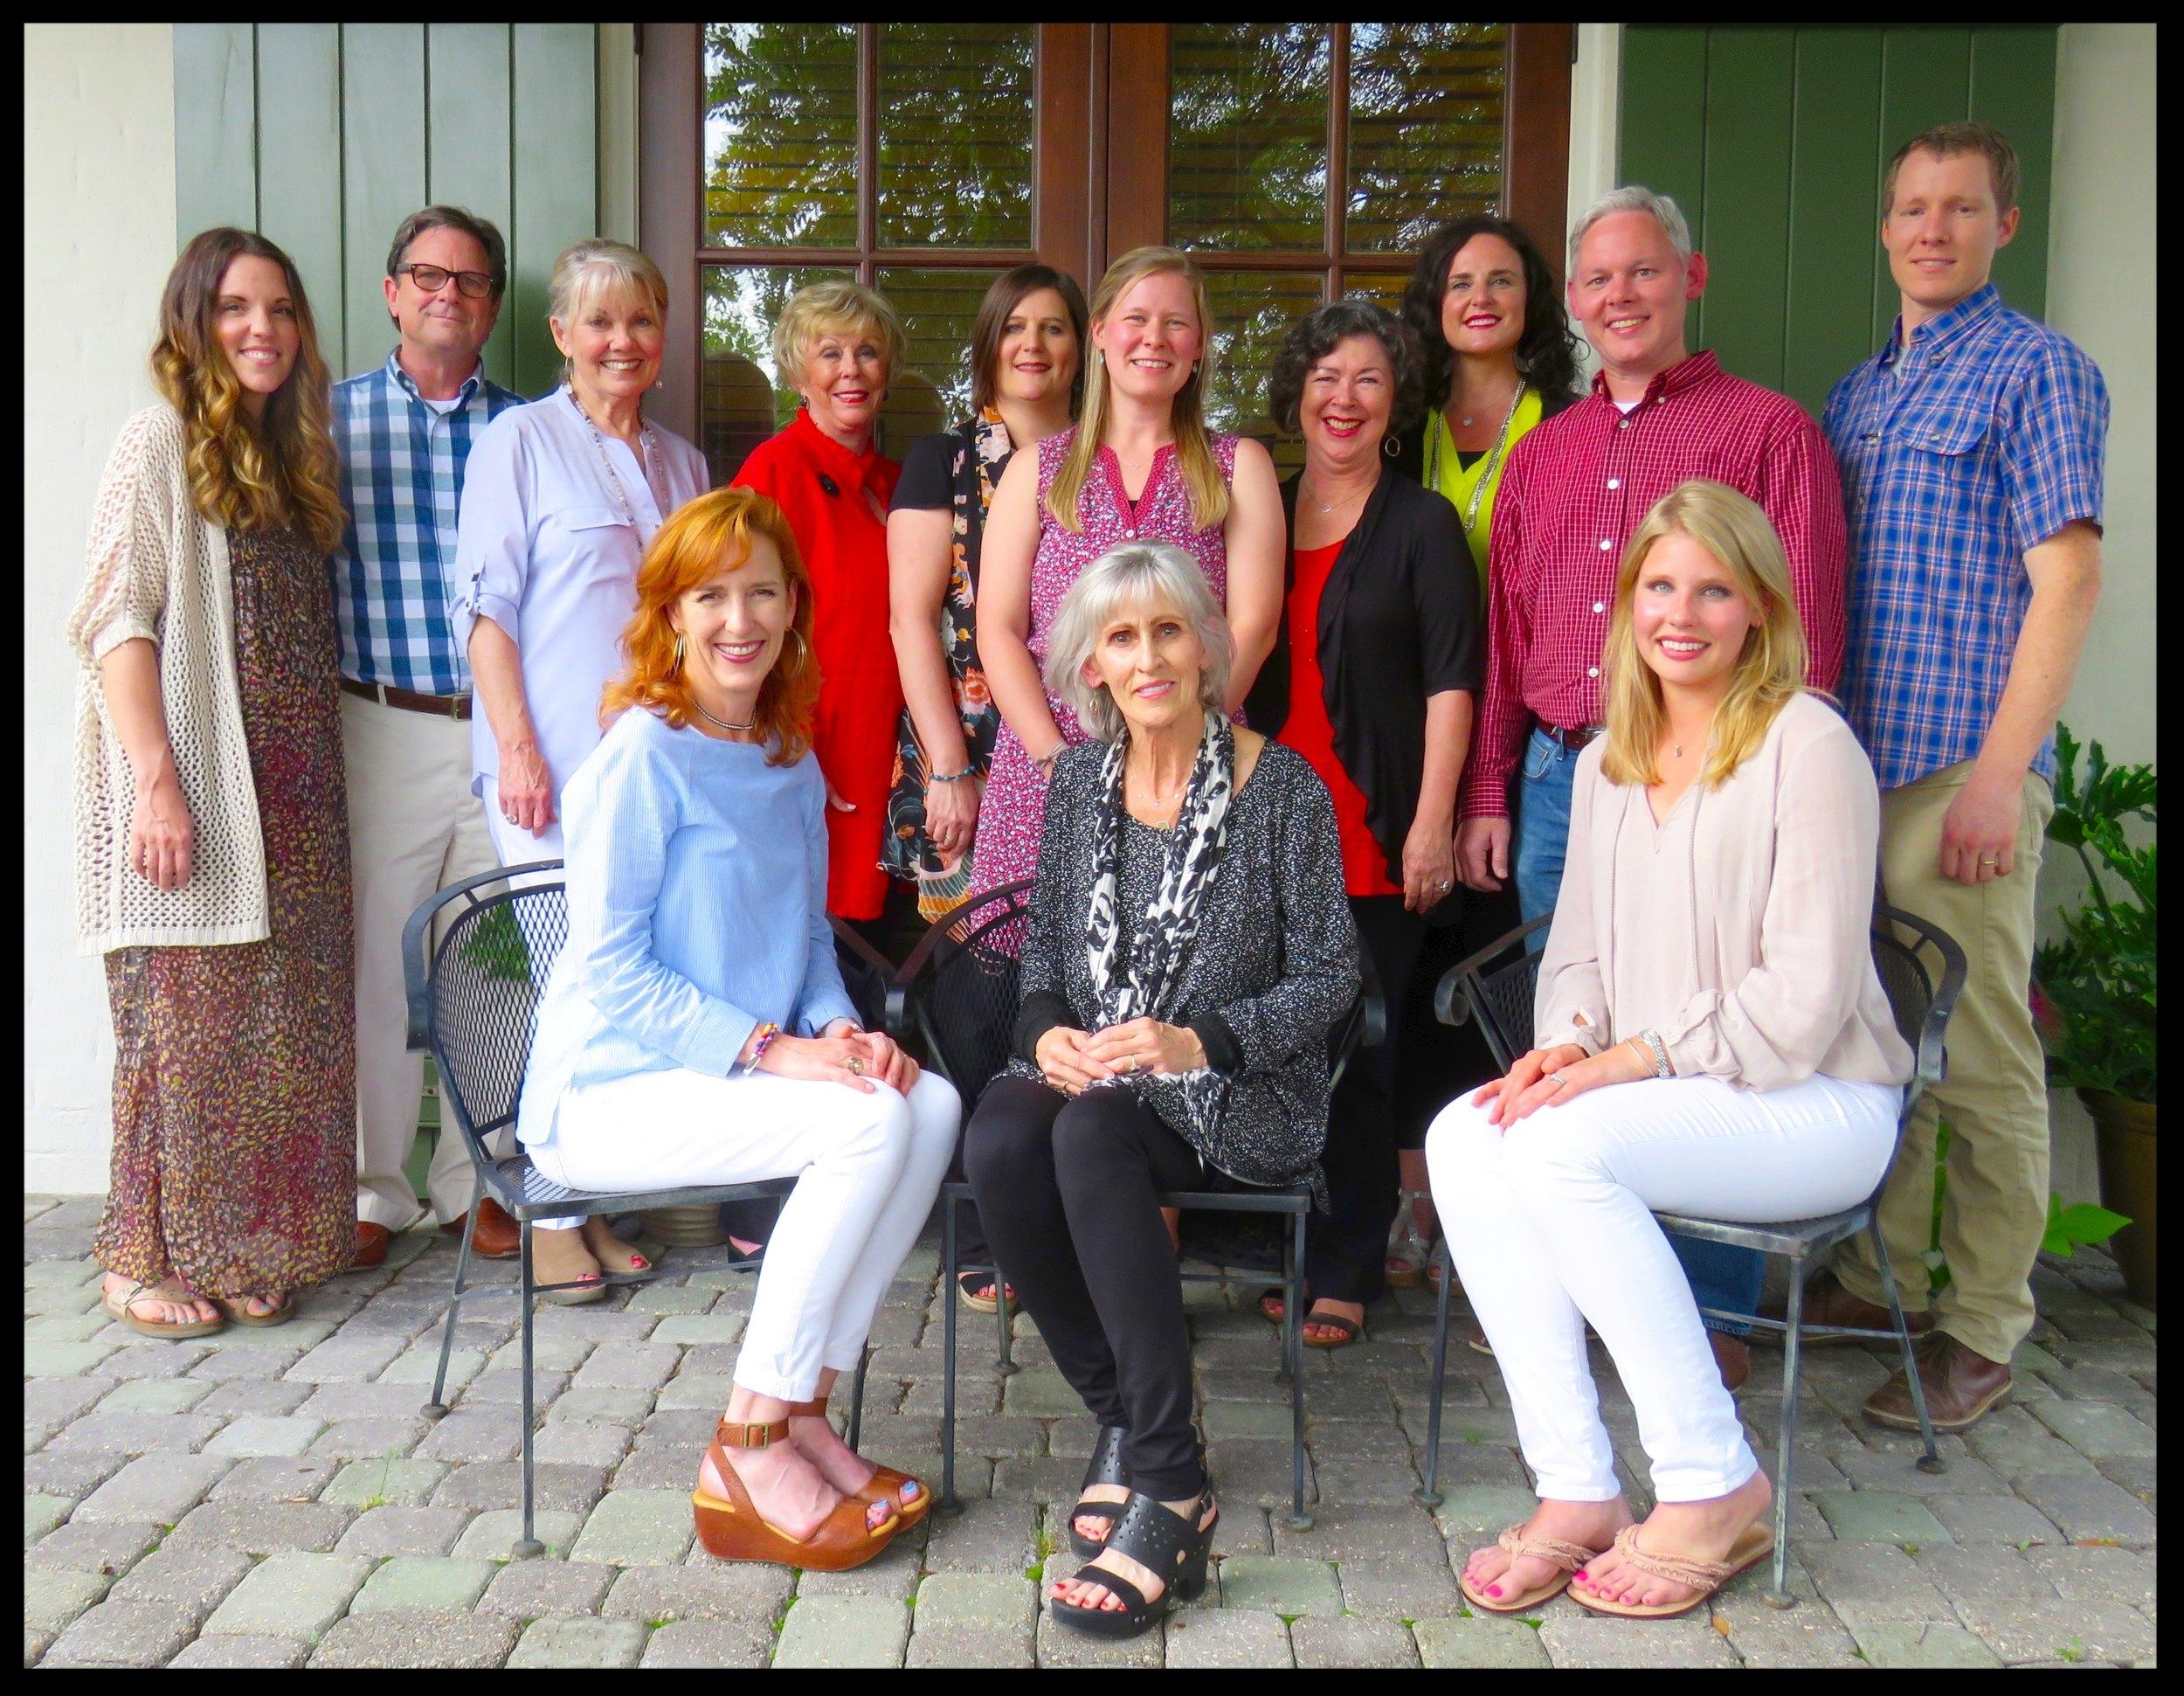 The Shepherd's Staff Group